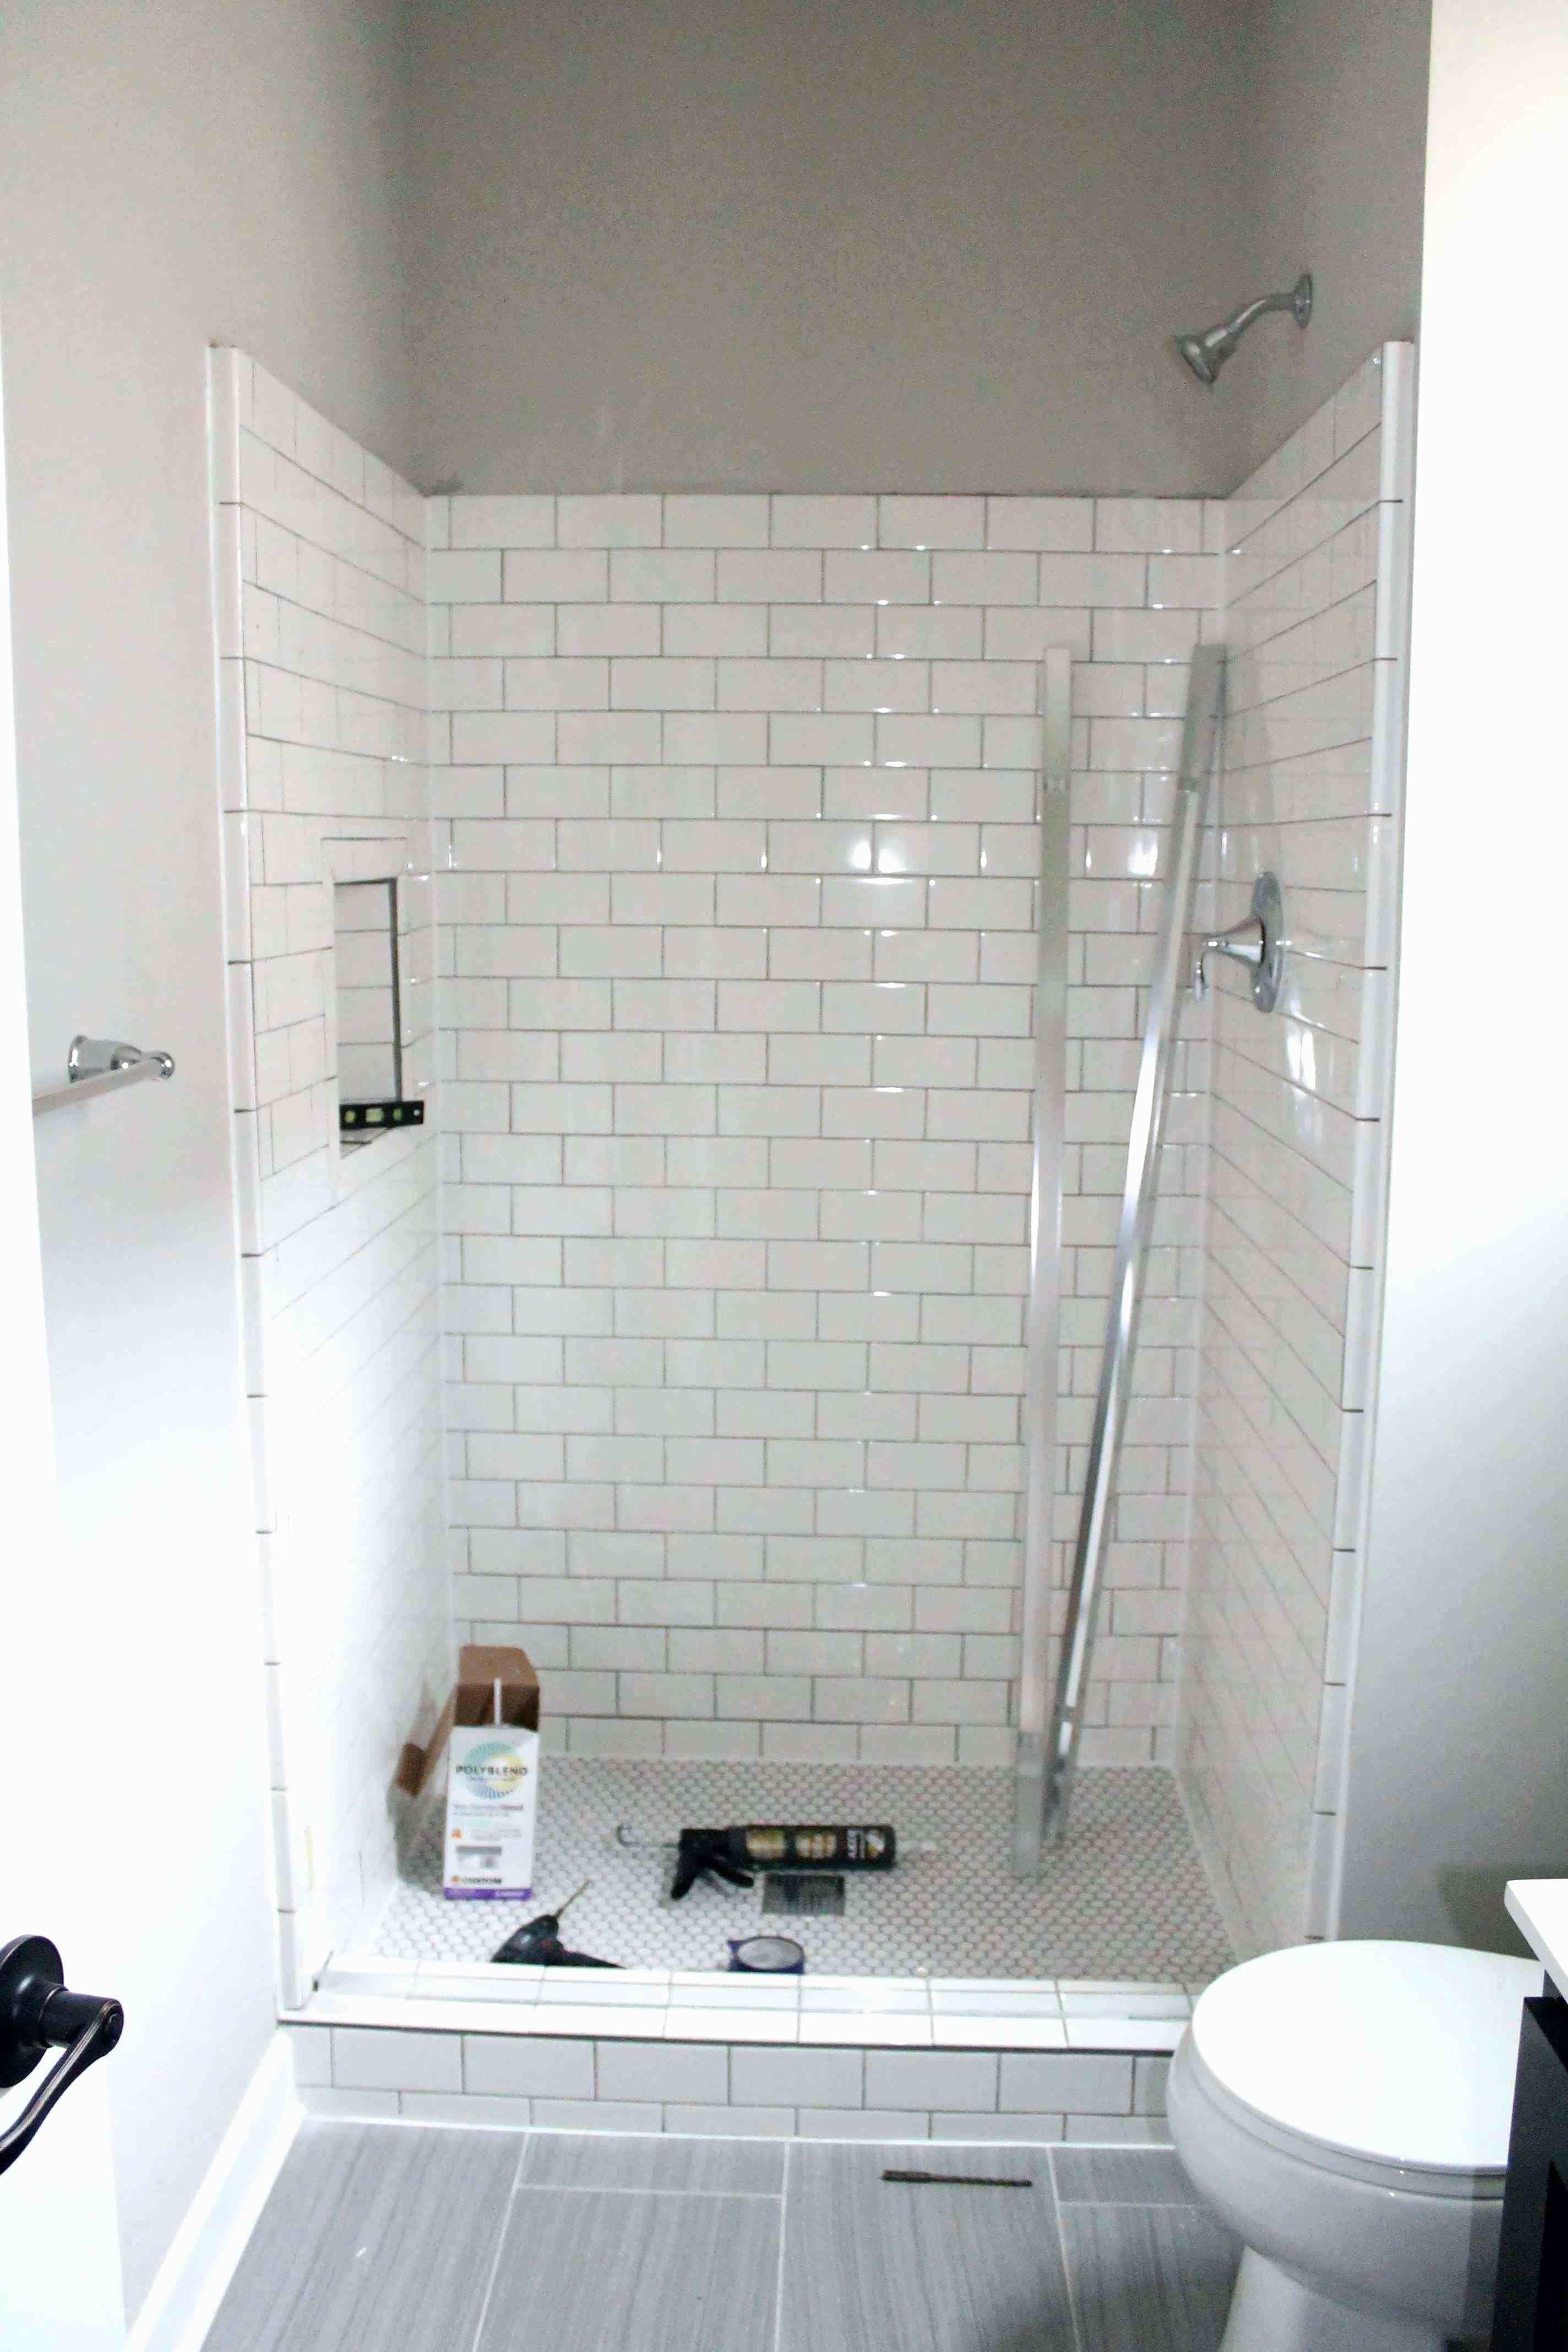 23 Modern Bathroom With Black Chevron Slate Flooring Ceplukan Tile Shower Niche Bathroom Shower Tile Subway Tile Showers